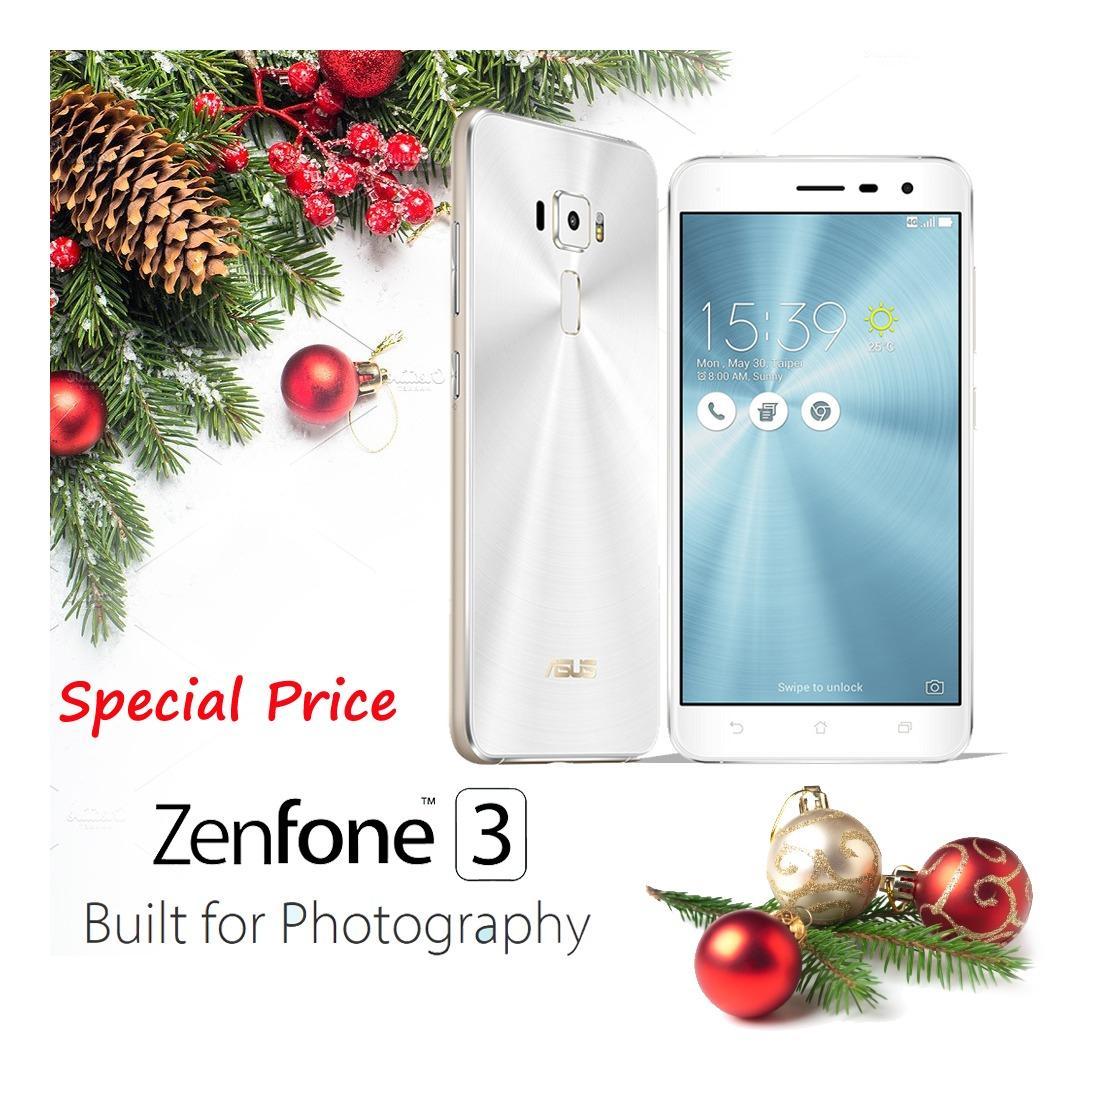 Jual Asus Zenfone 3 Ze520Kl 4Gb Ram 32Gb Internal Garansi Resmi Ori